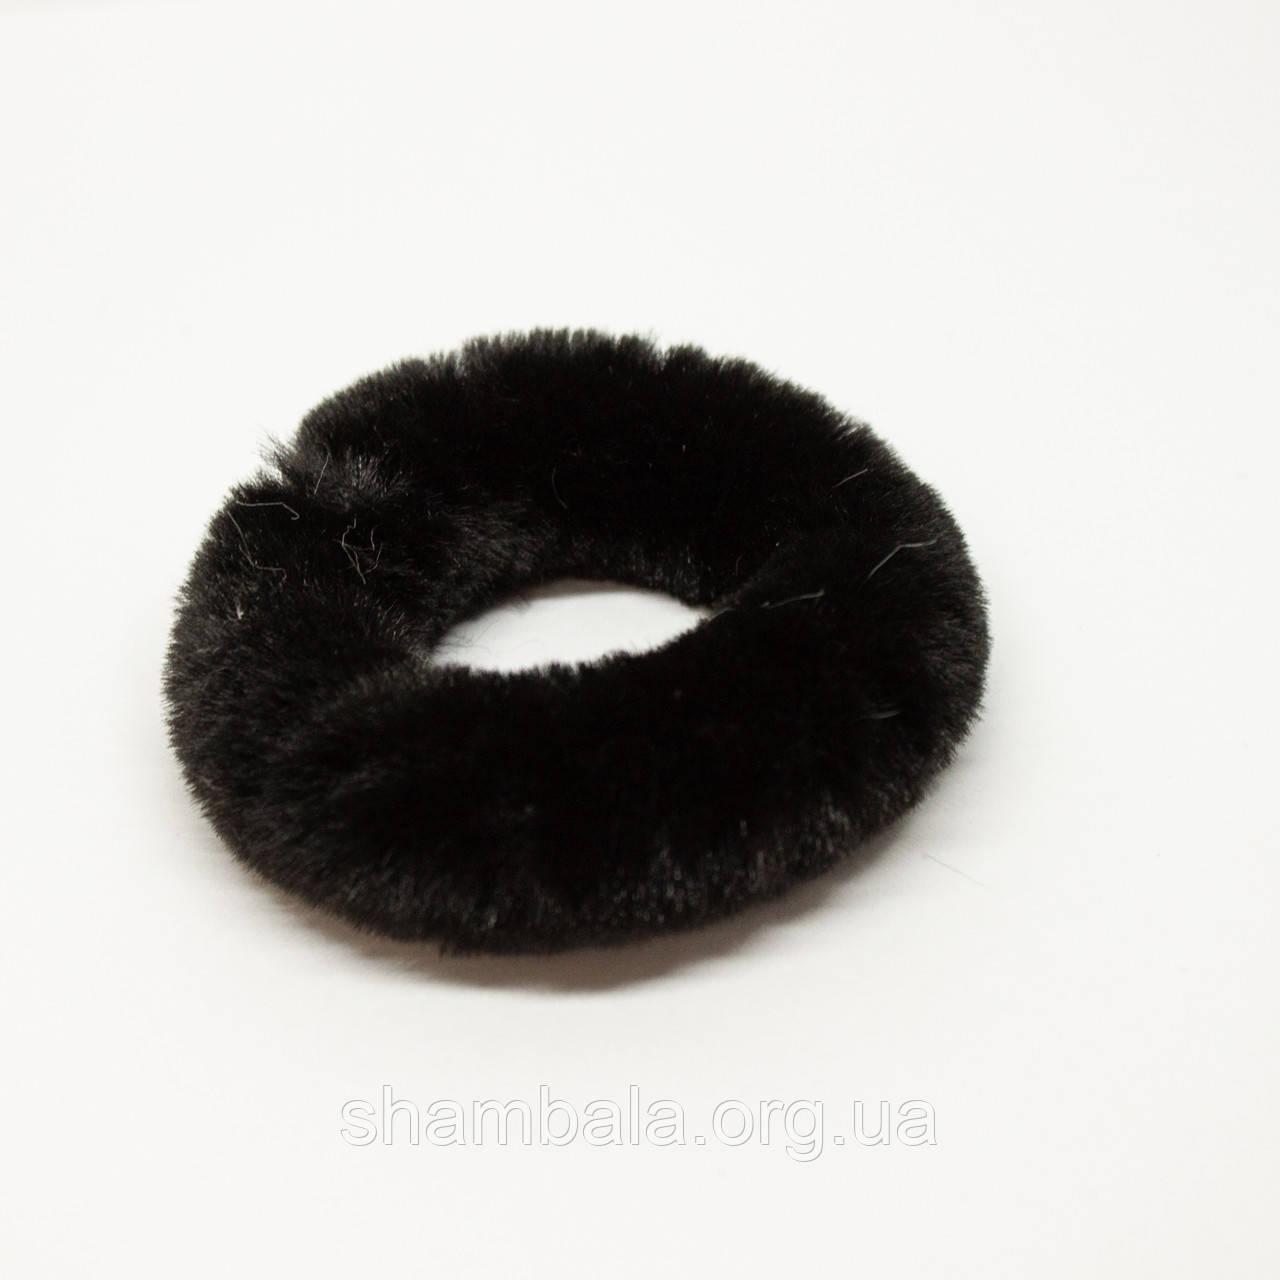 Хутряна гумка для волосся Xuping Jewelry чорна (65083)